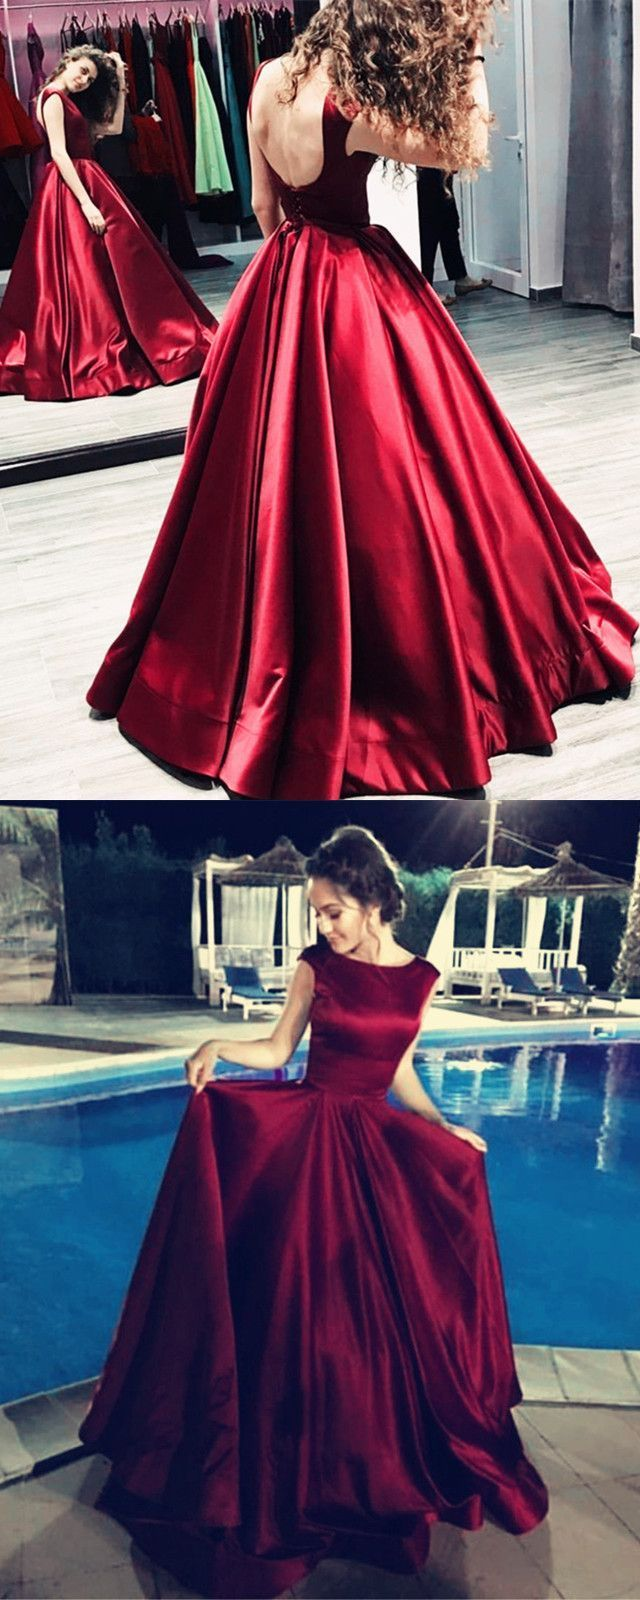 Maroon prom dresses ballgowns,satin evening dress,backless prom dresses #eveningdresses #longpromdresses